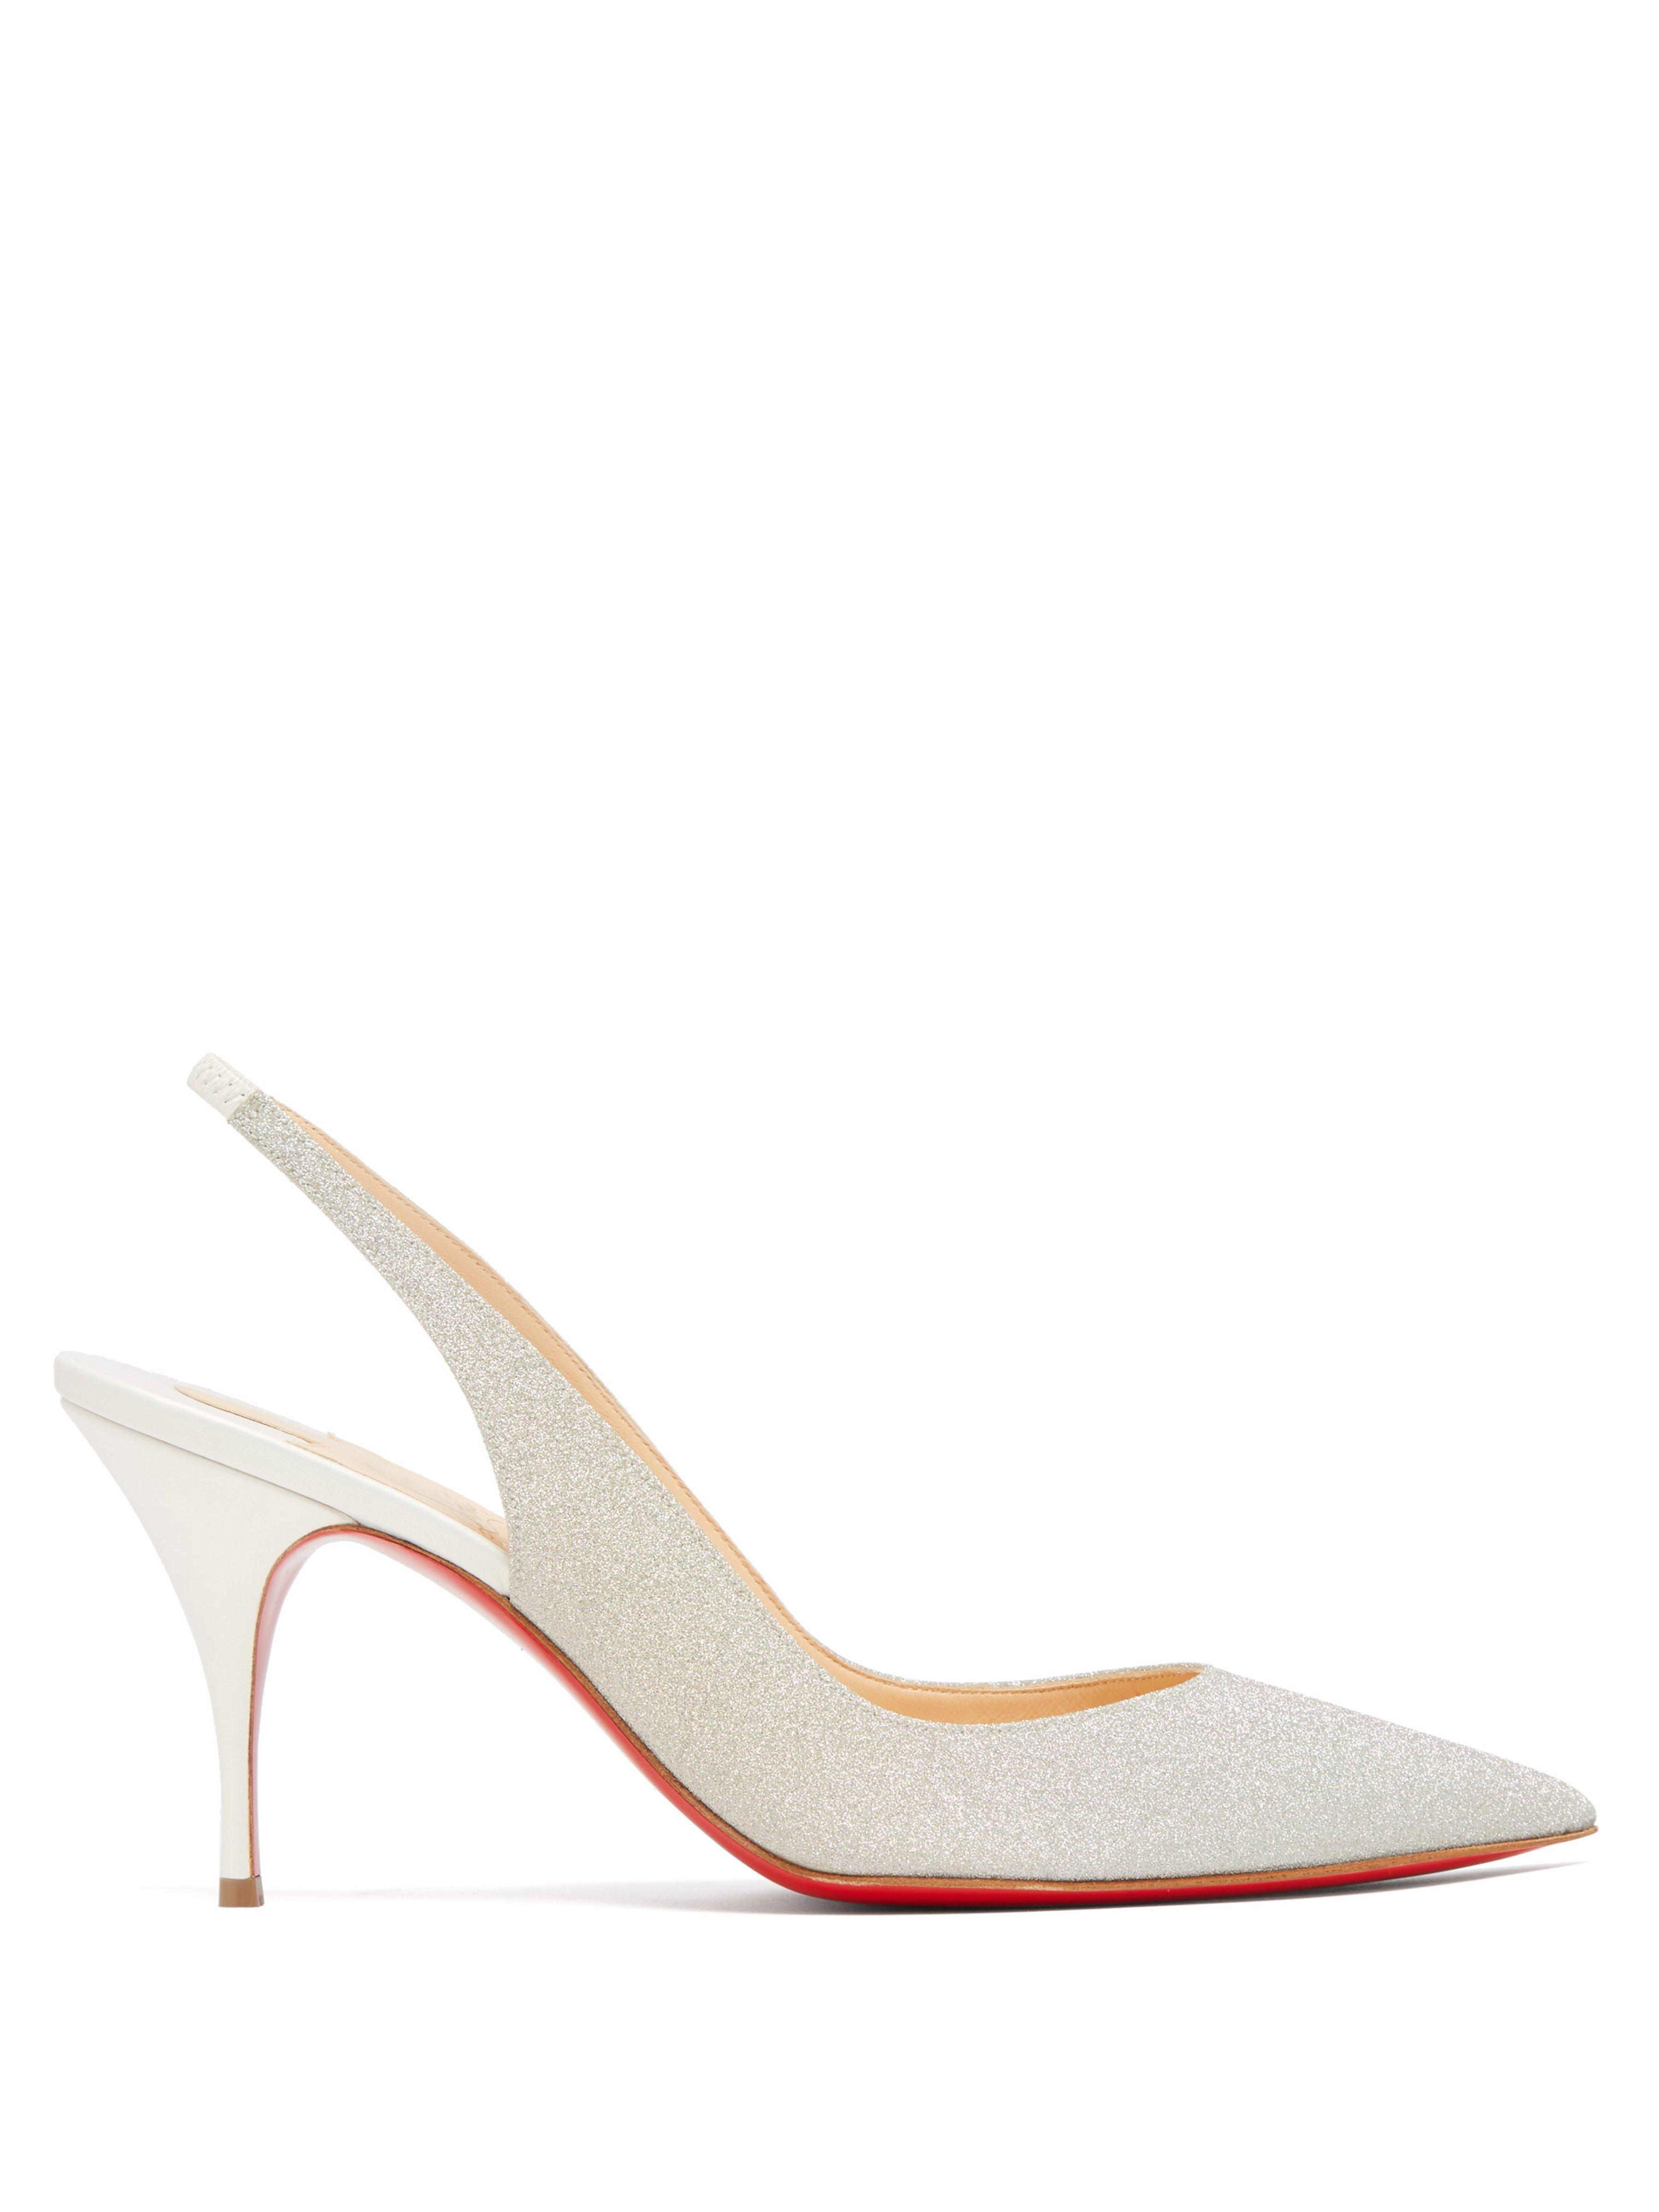 cfa1689d61e1 Christian Louboutin. Women s Clare Slingback Glitter Court Shoes